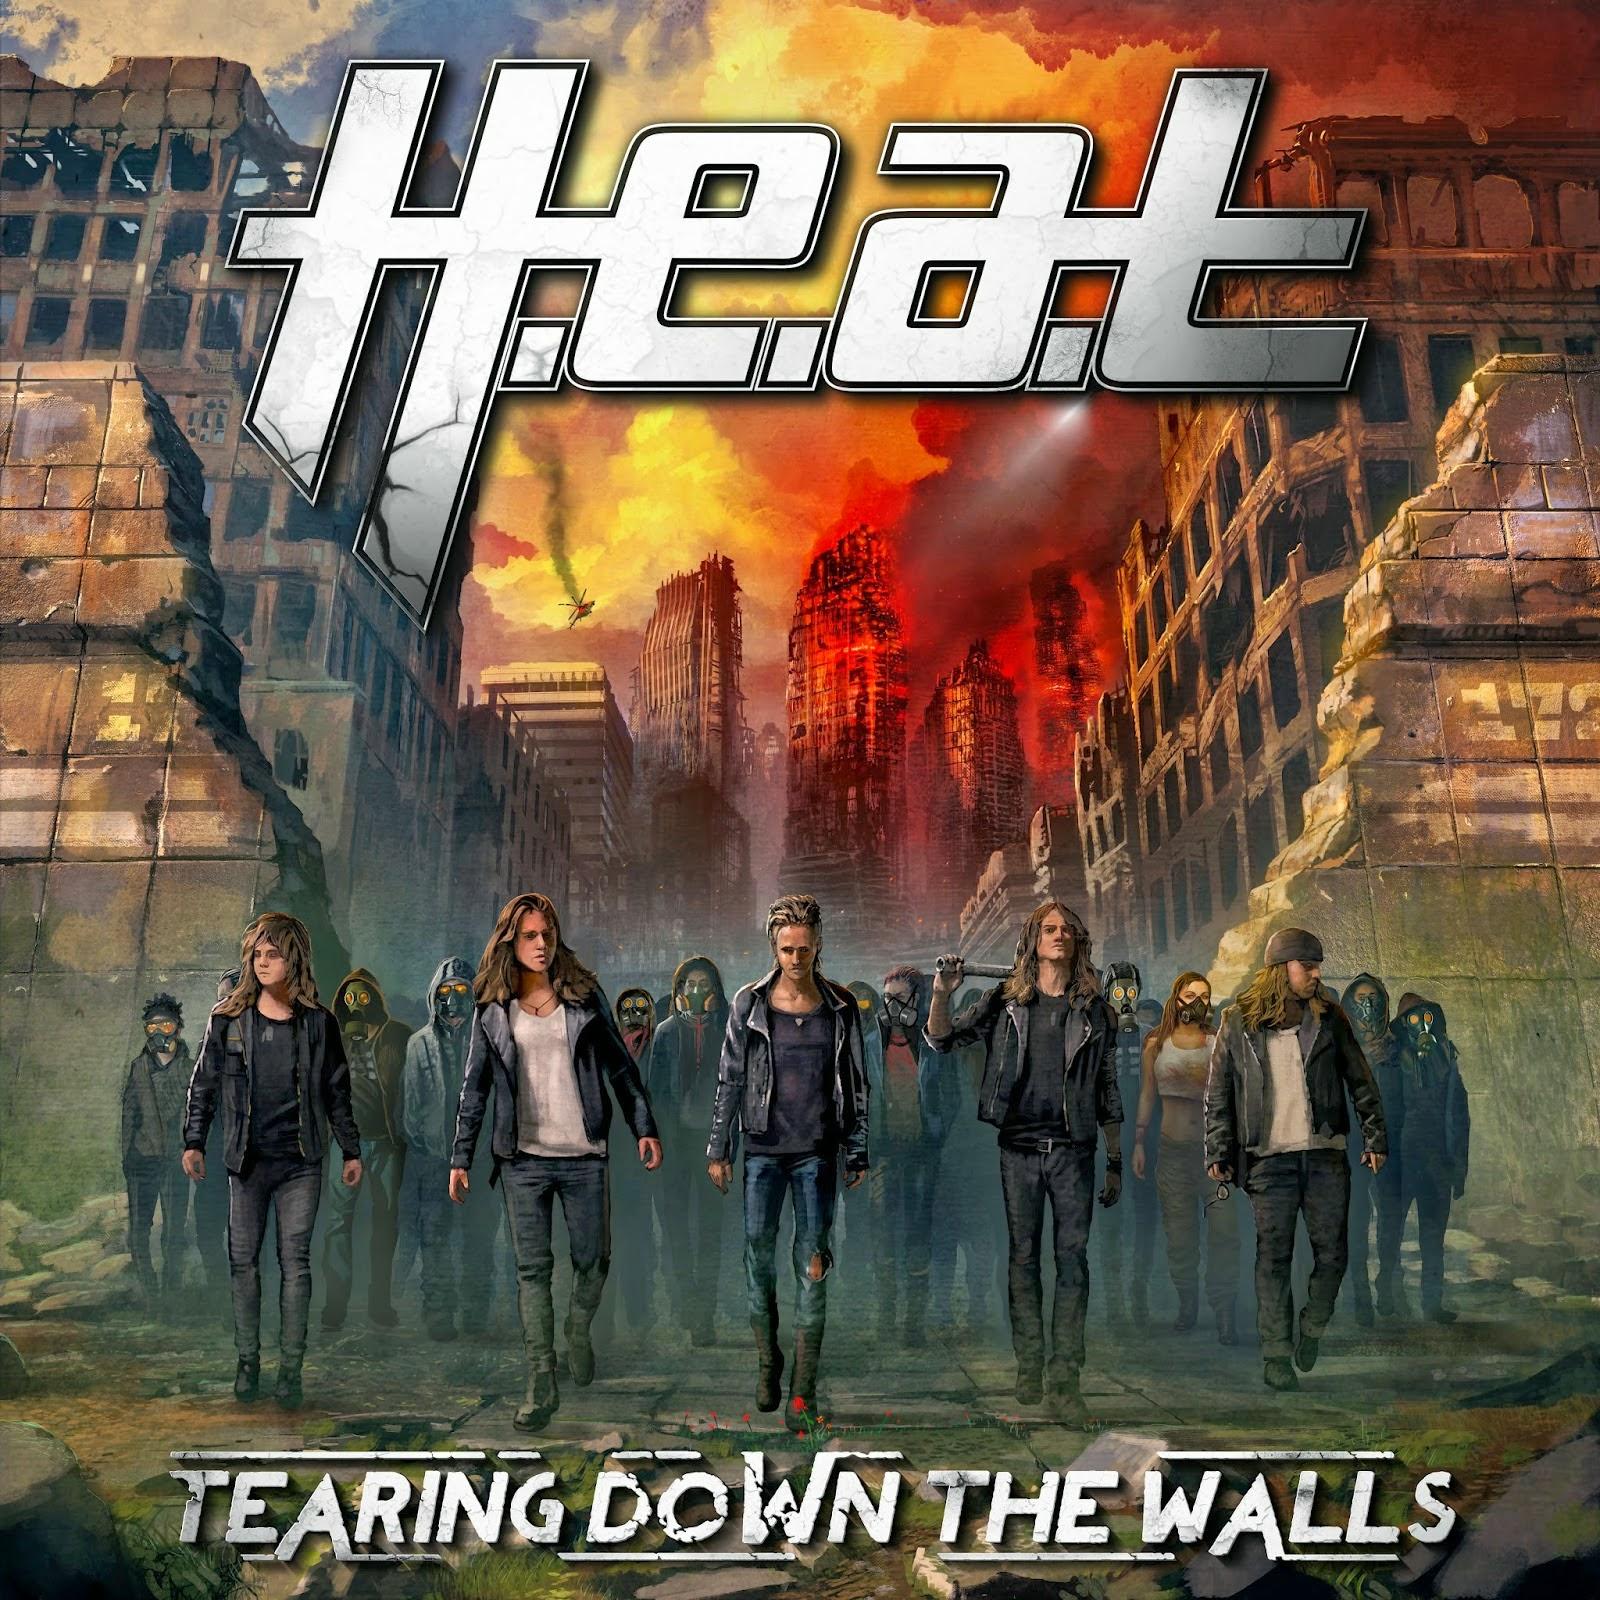 http://rock-and-metal-4-you.blogspot.de/2014/04/cd-review-heat-tearing-down-walls.html